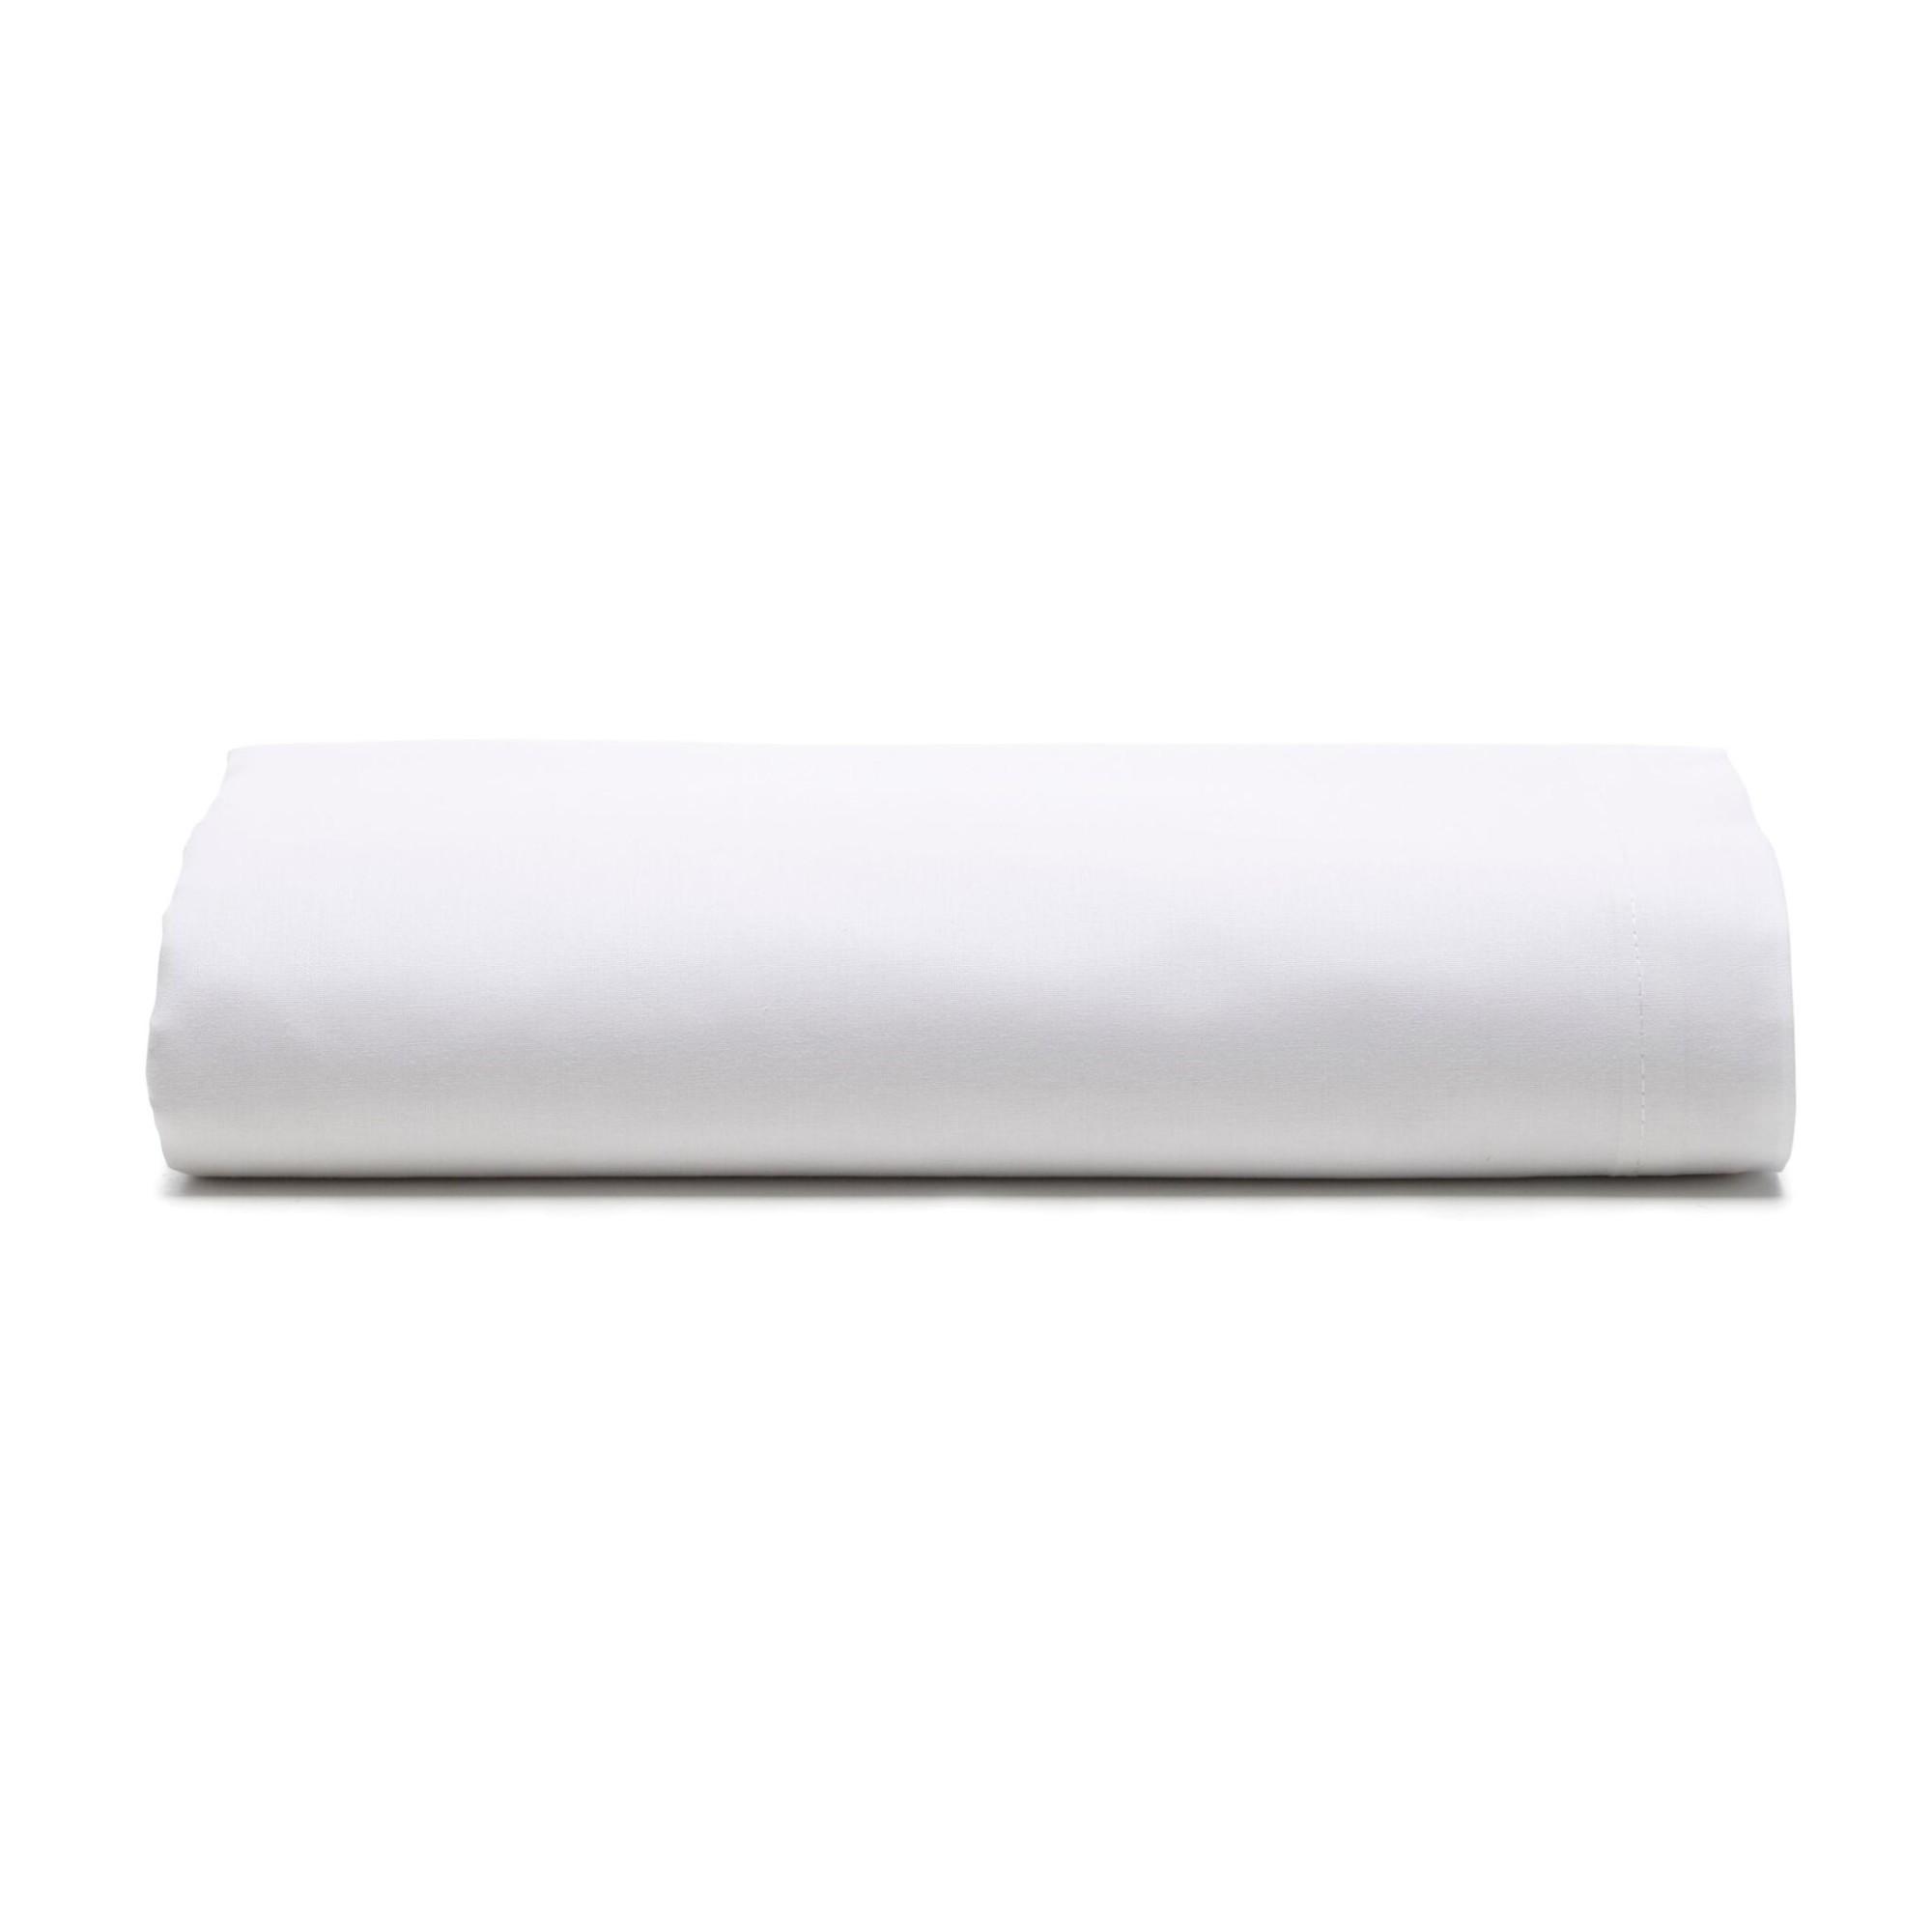 Lencol Casal Royal com Elastico 100 Algodao Branco - Santista